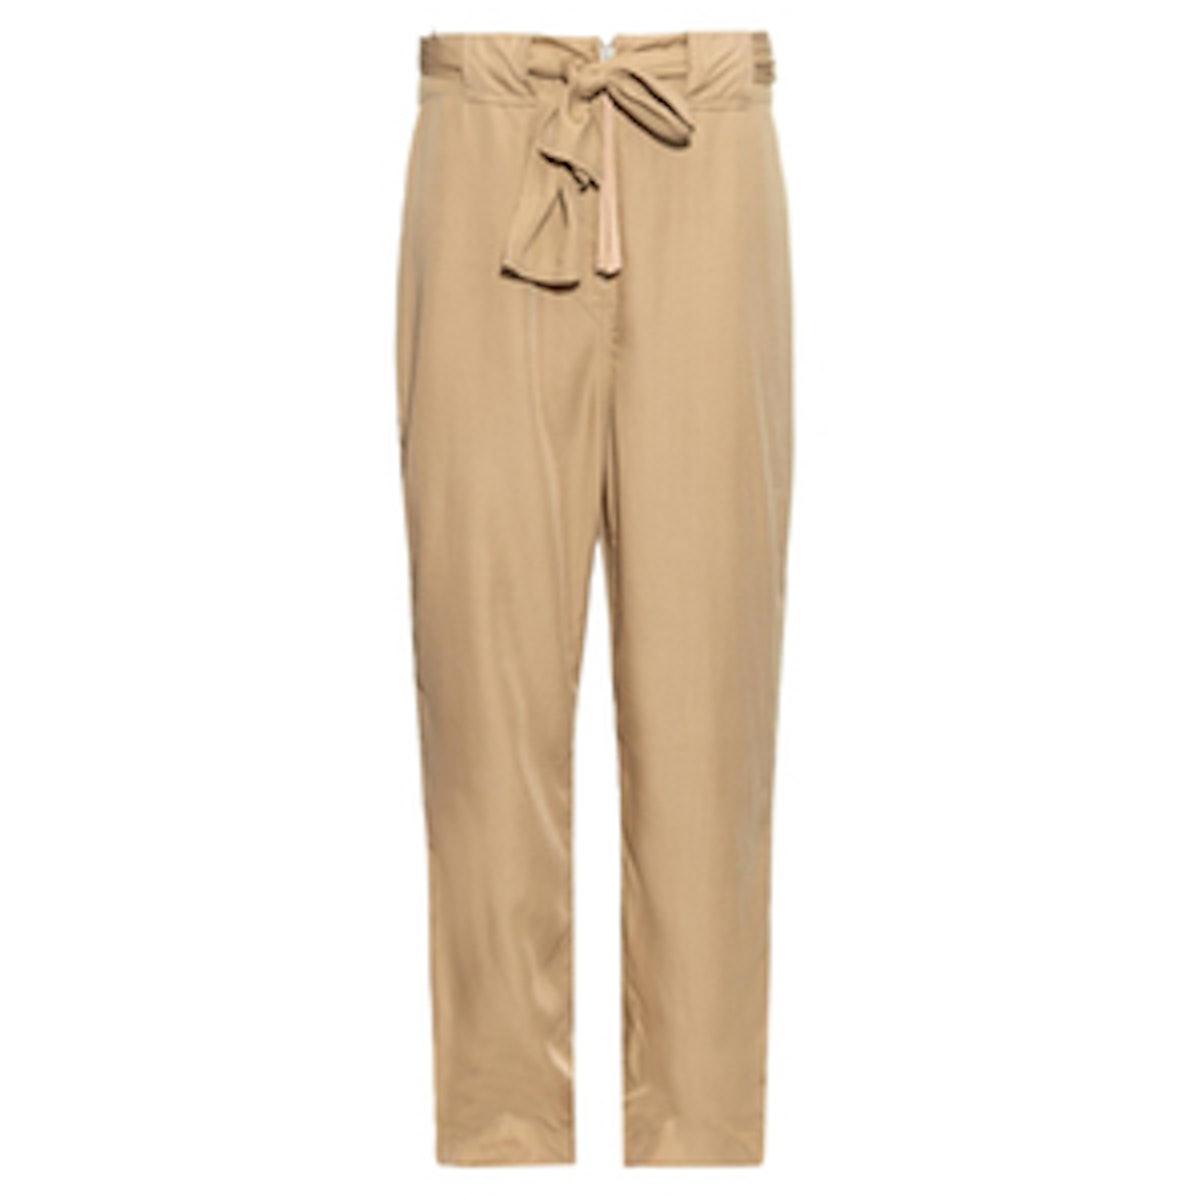 Este Lightweight Slouchy Trousers